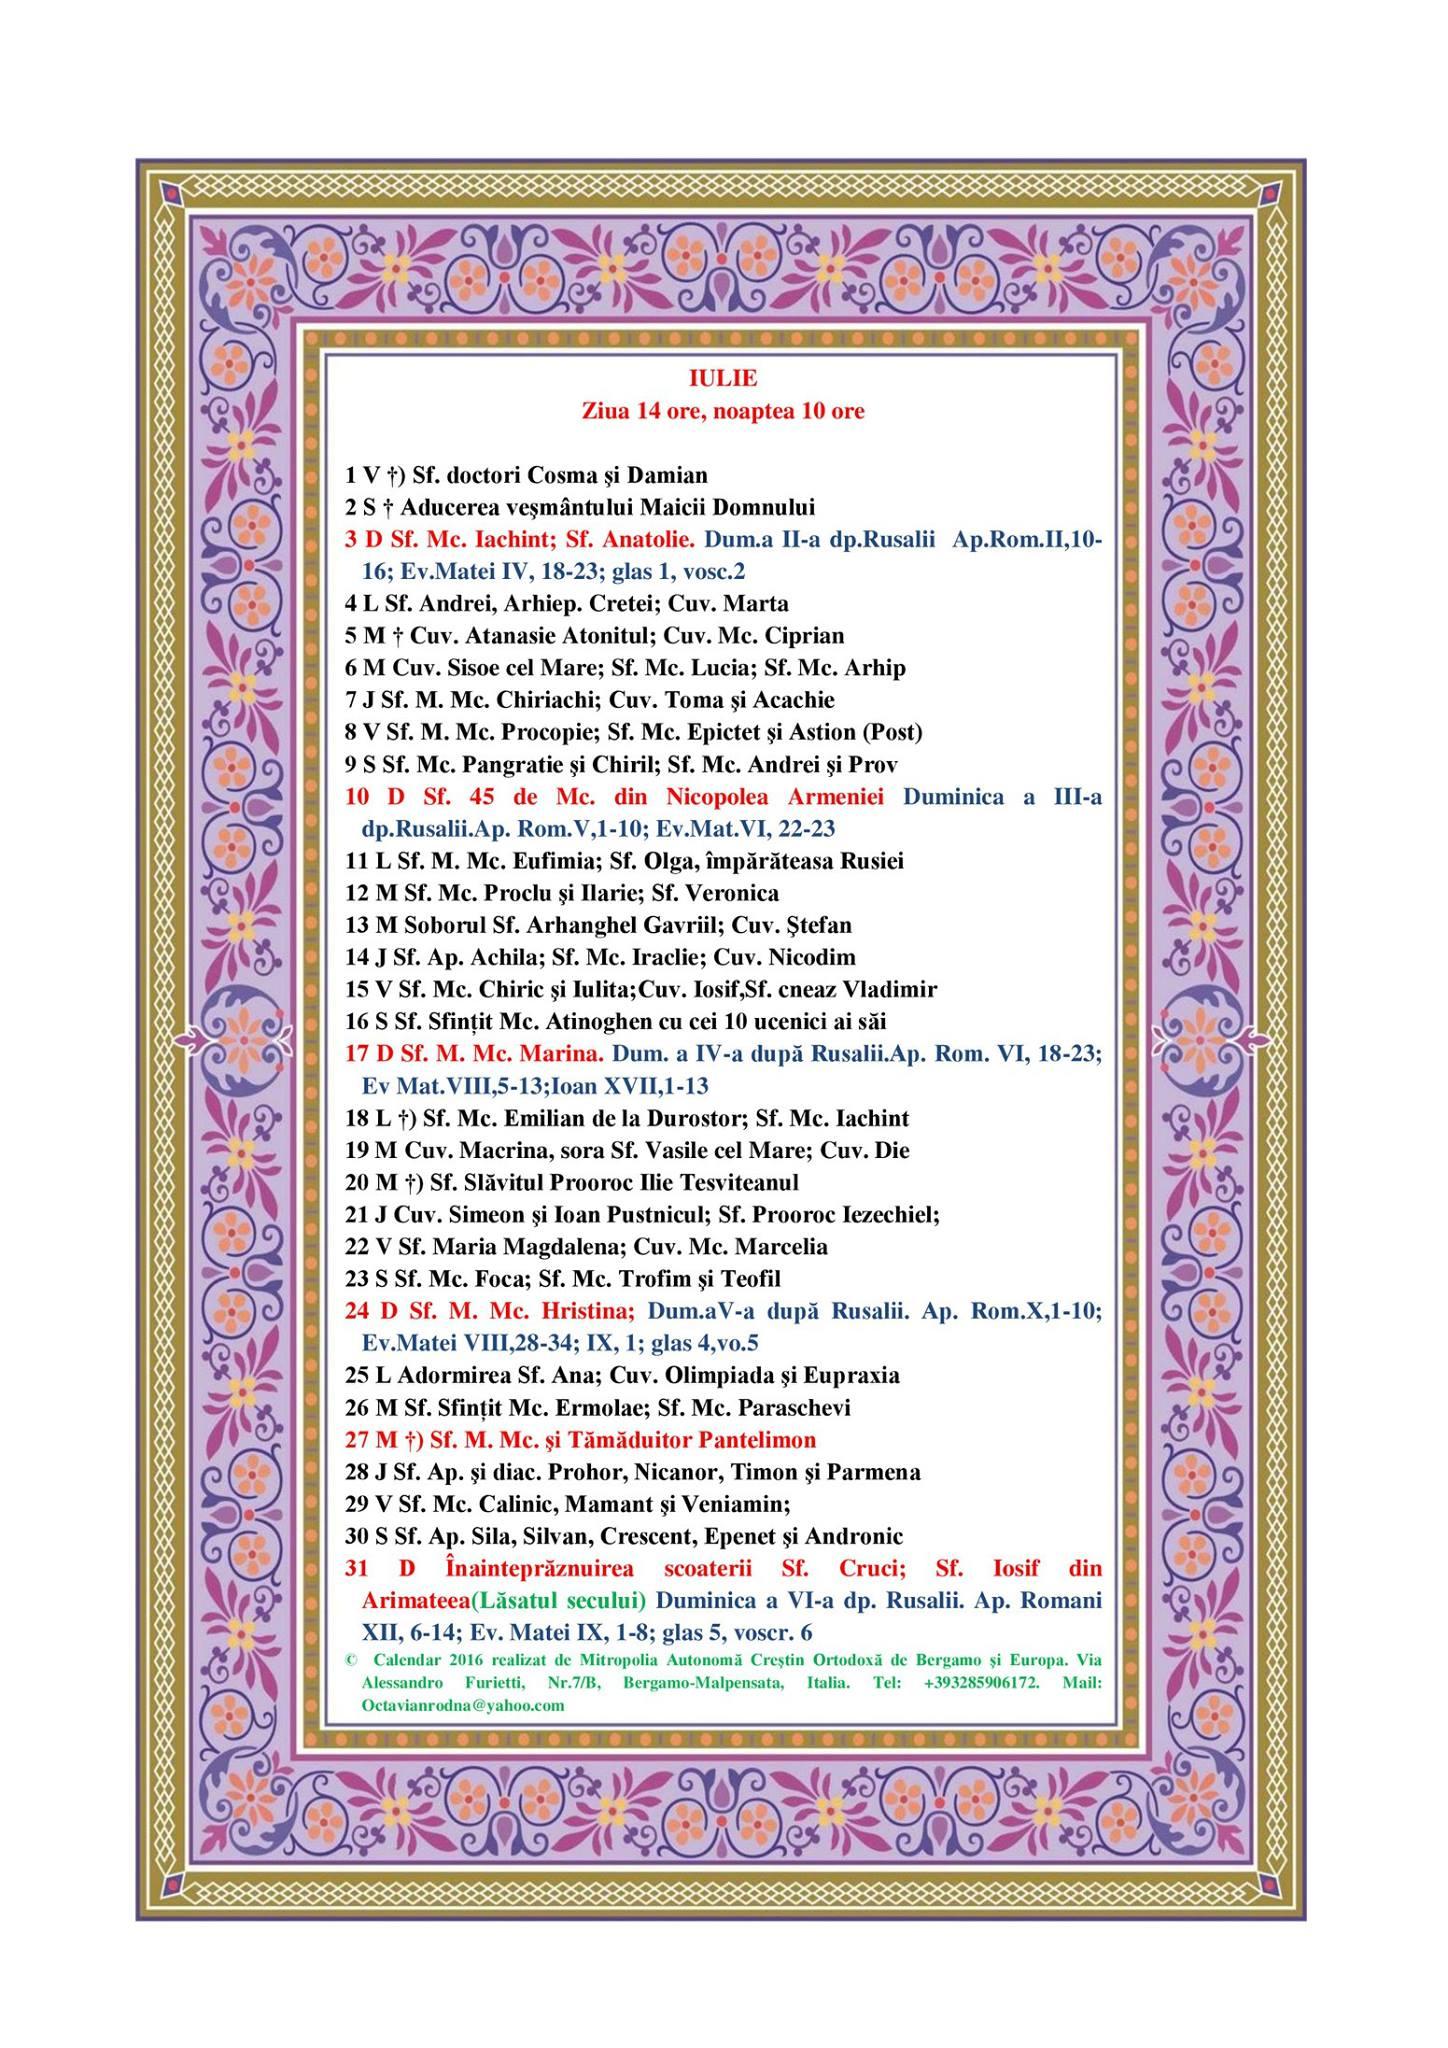 Calendar Ortodox 2016 Februarie | Search Results | Summary Daily ...